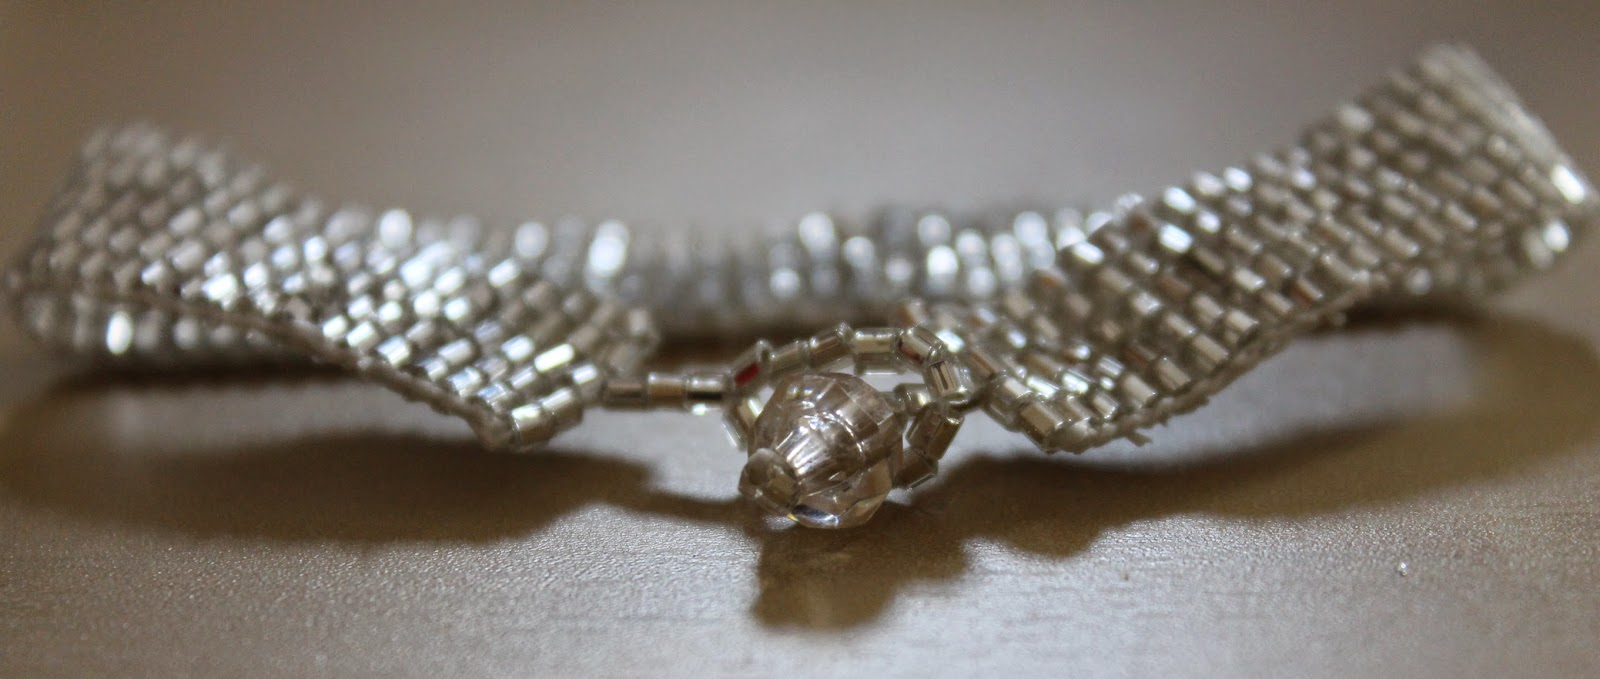 shiny silver bead loom bracelet